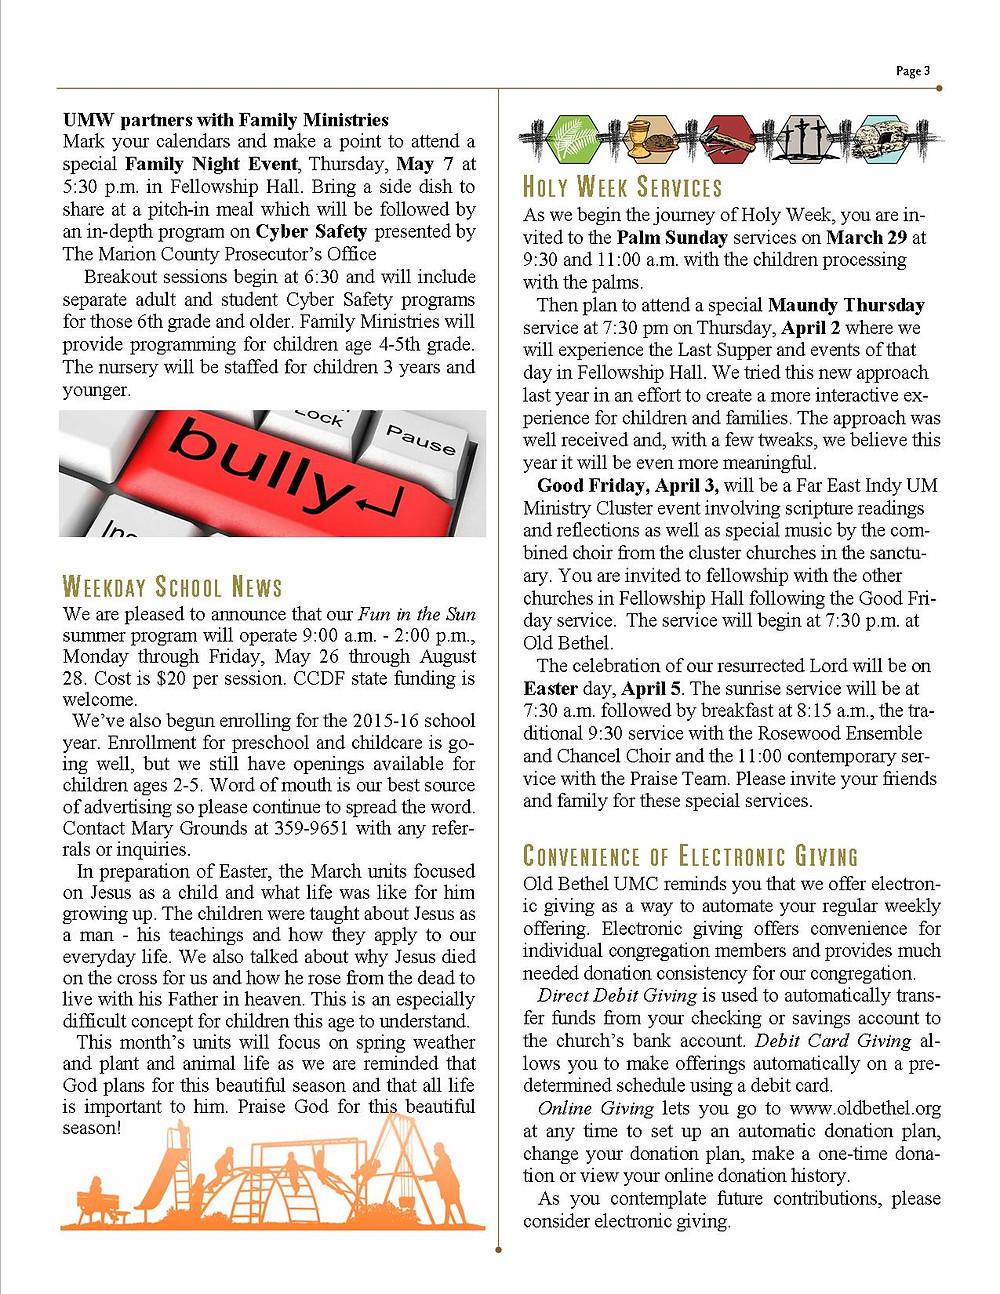 04 April Shofar 2015 page 3.jpg